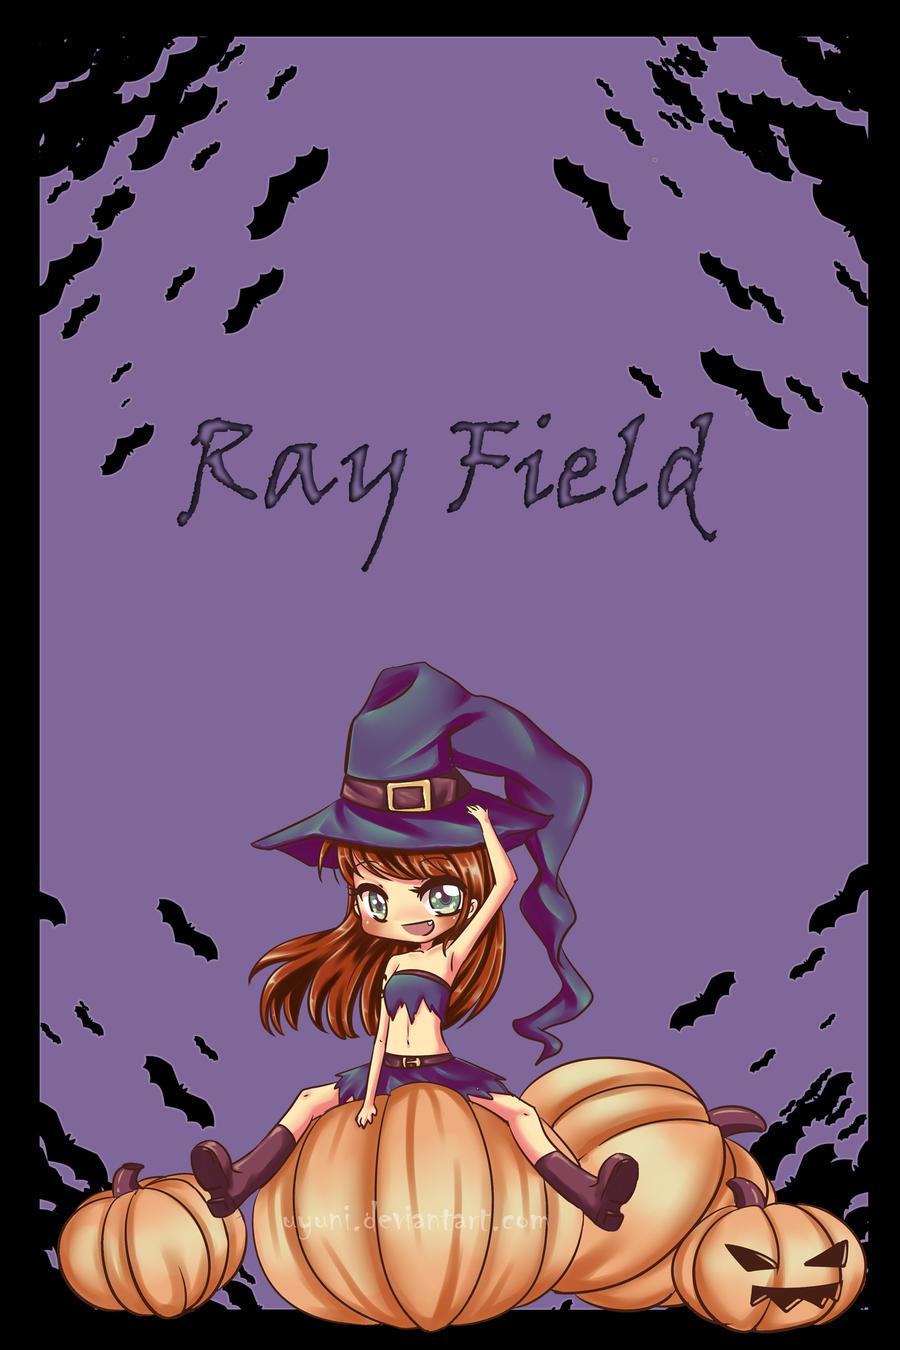 Ray Field by uyuni